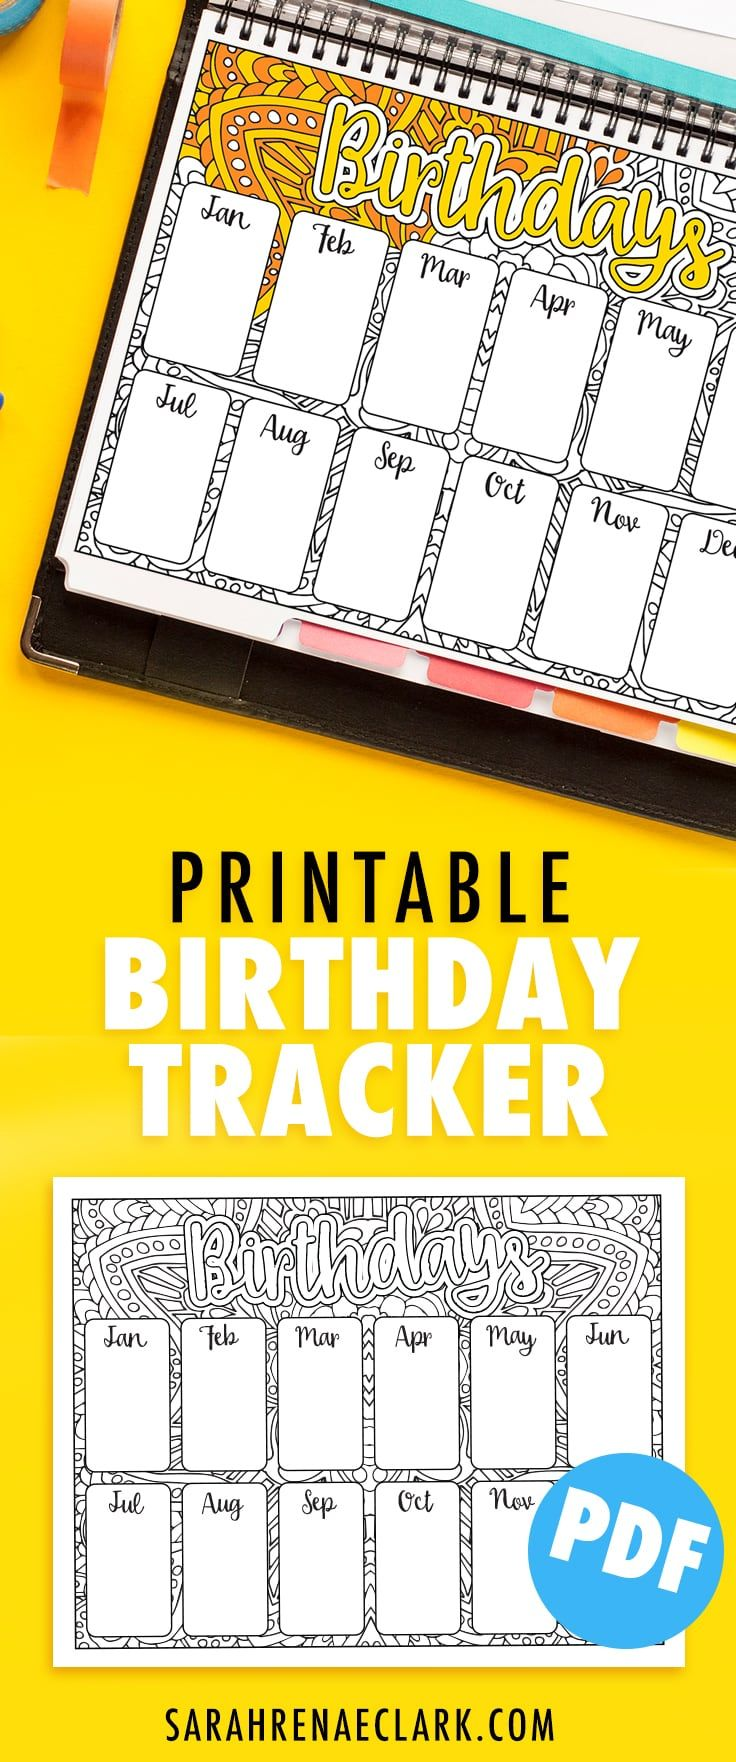 Birthday Tracker Printable   Pinterest   Planner inserts, Printable ...